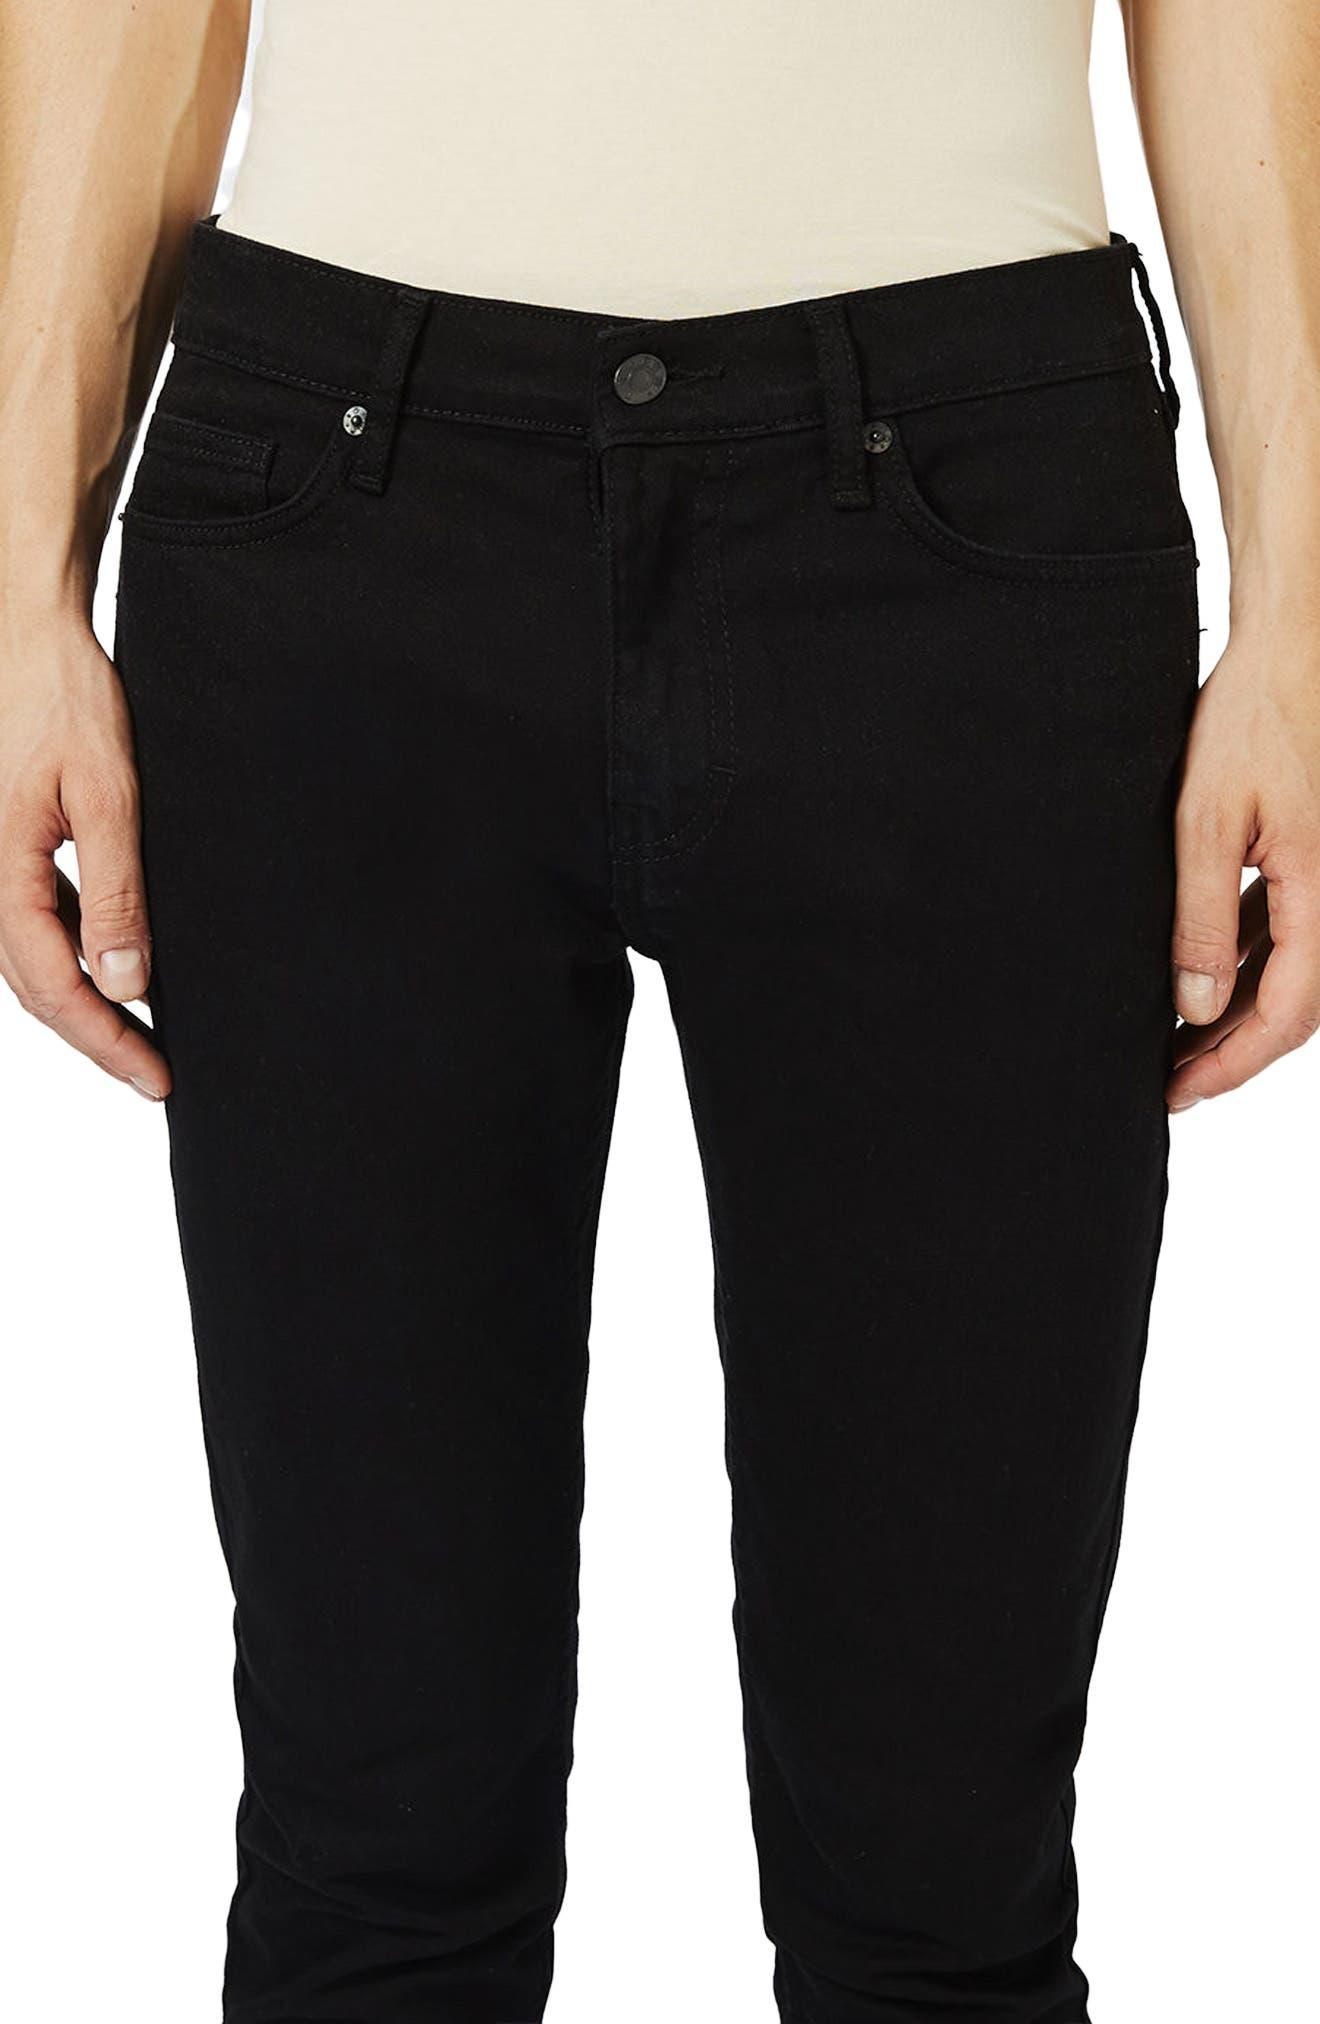 Skinny Stretch Jeans,                             Alternate thumbnail 3, color,                             BLACK